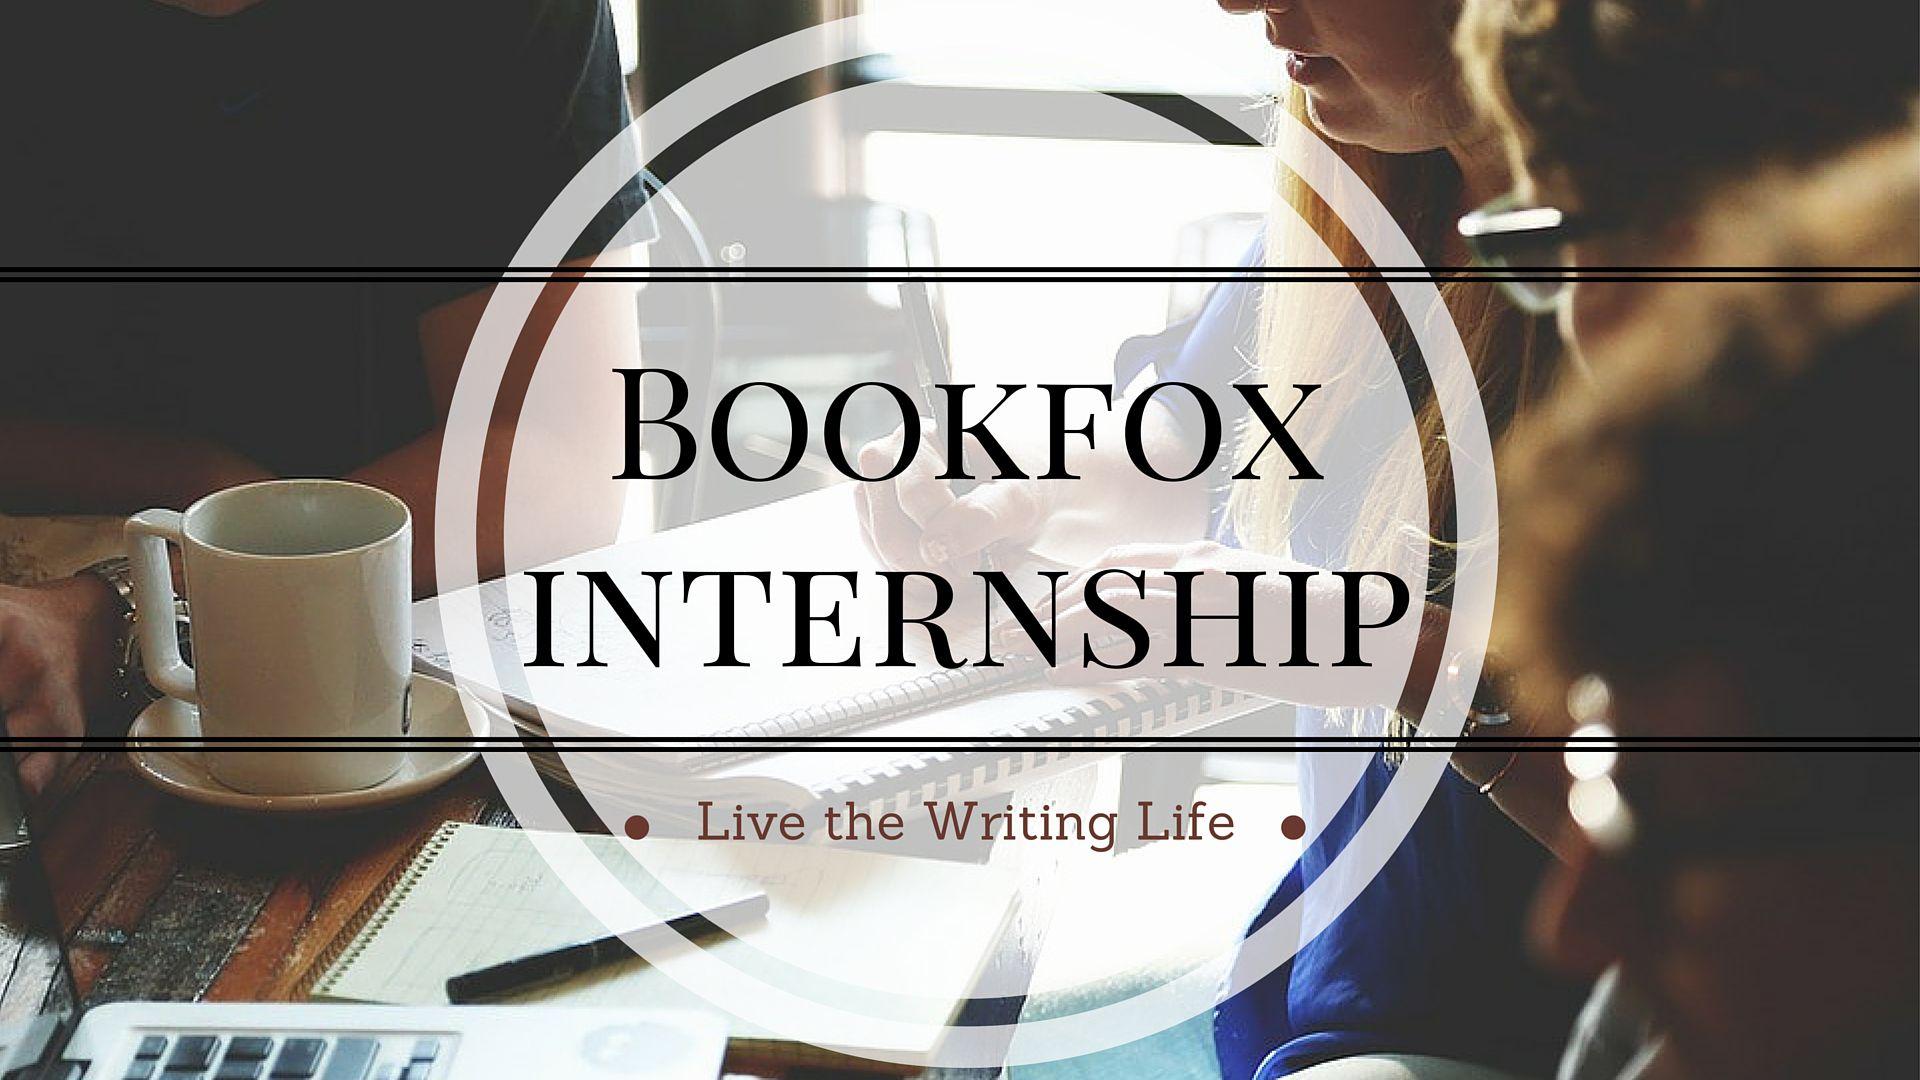 BookfoxInternship